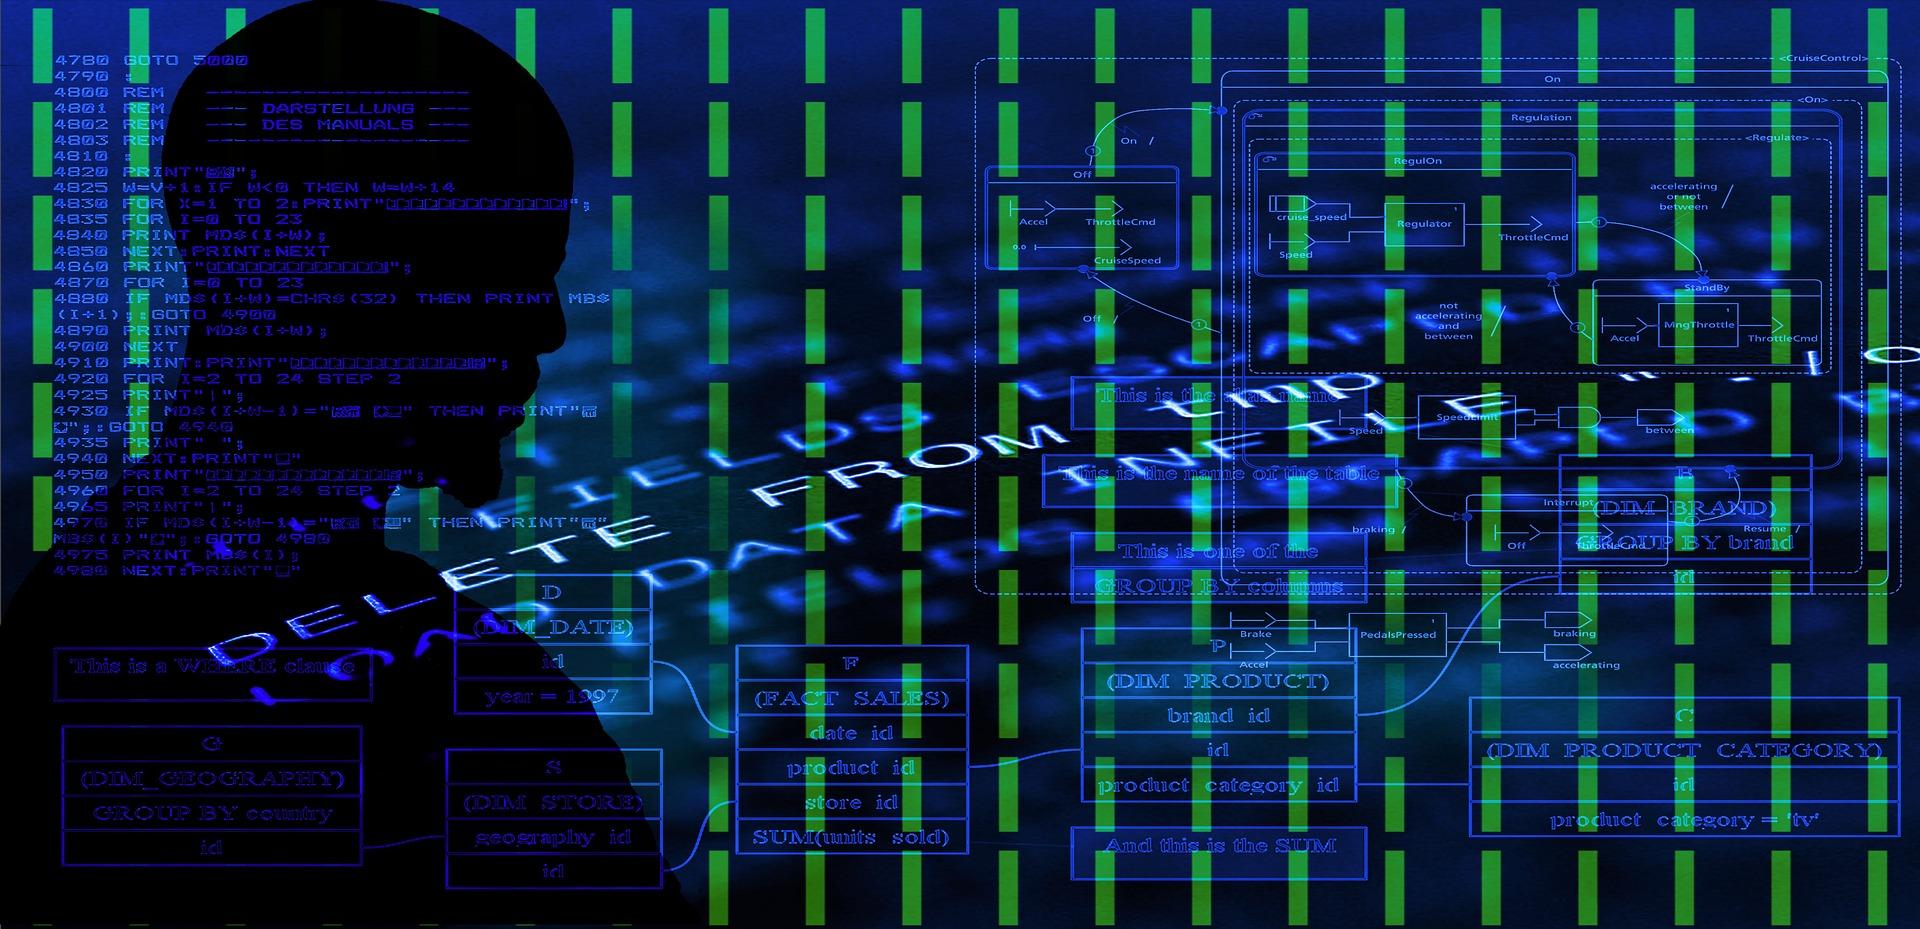 Hacker Group Turla Use a New Malware To Profile Targets